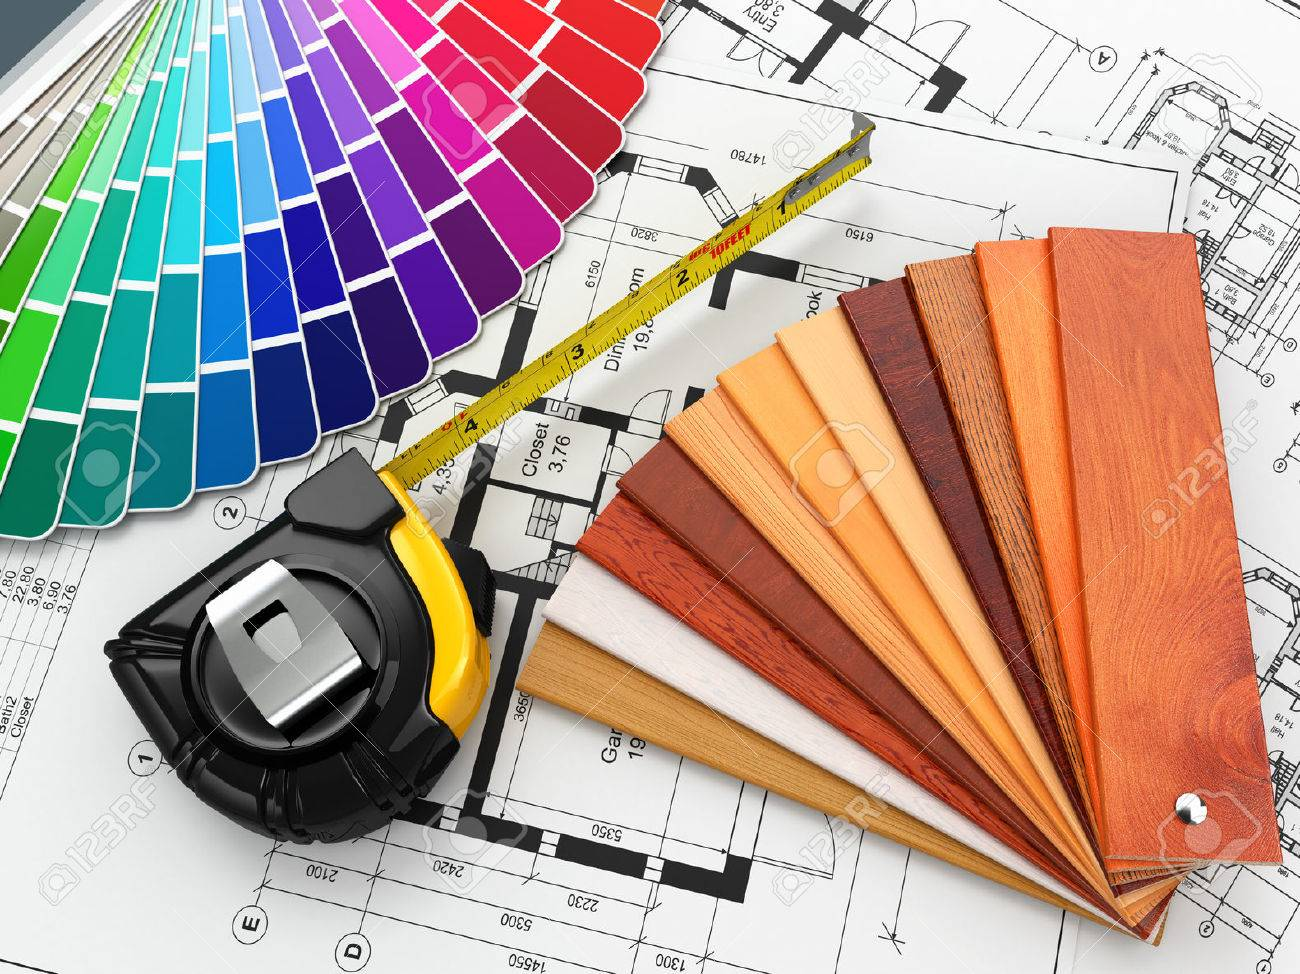 Interior Design. rchitectural Materials, Measuring ools nd ... - ^